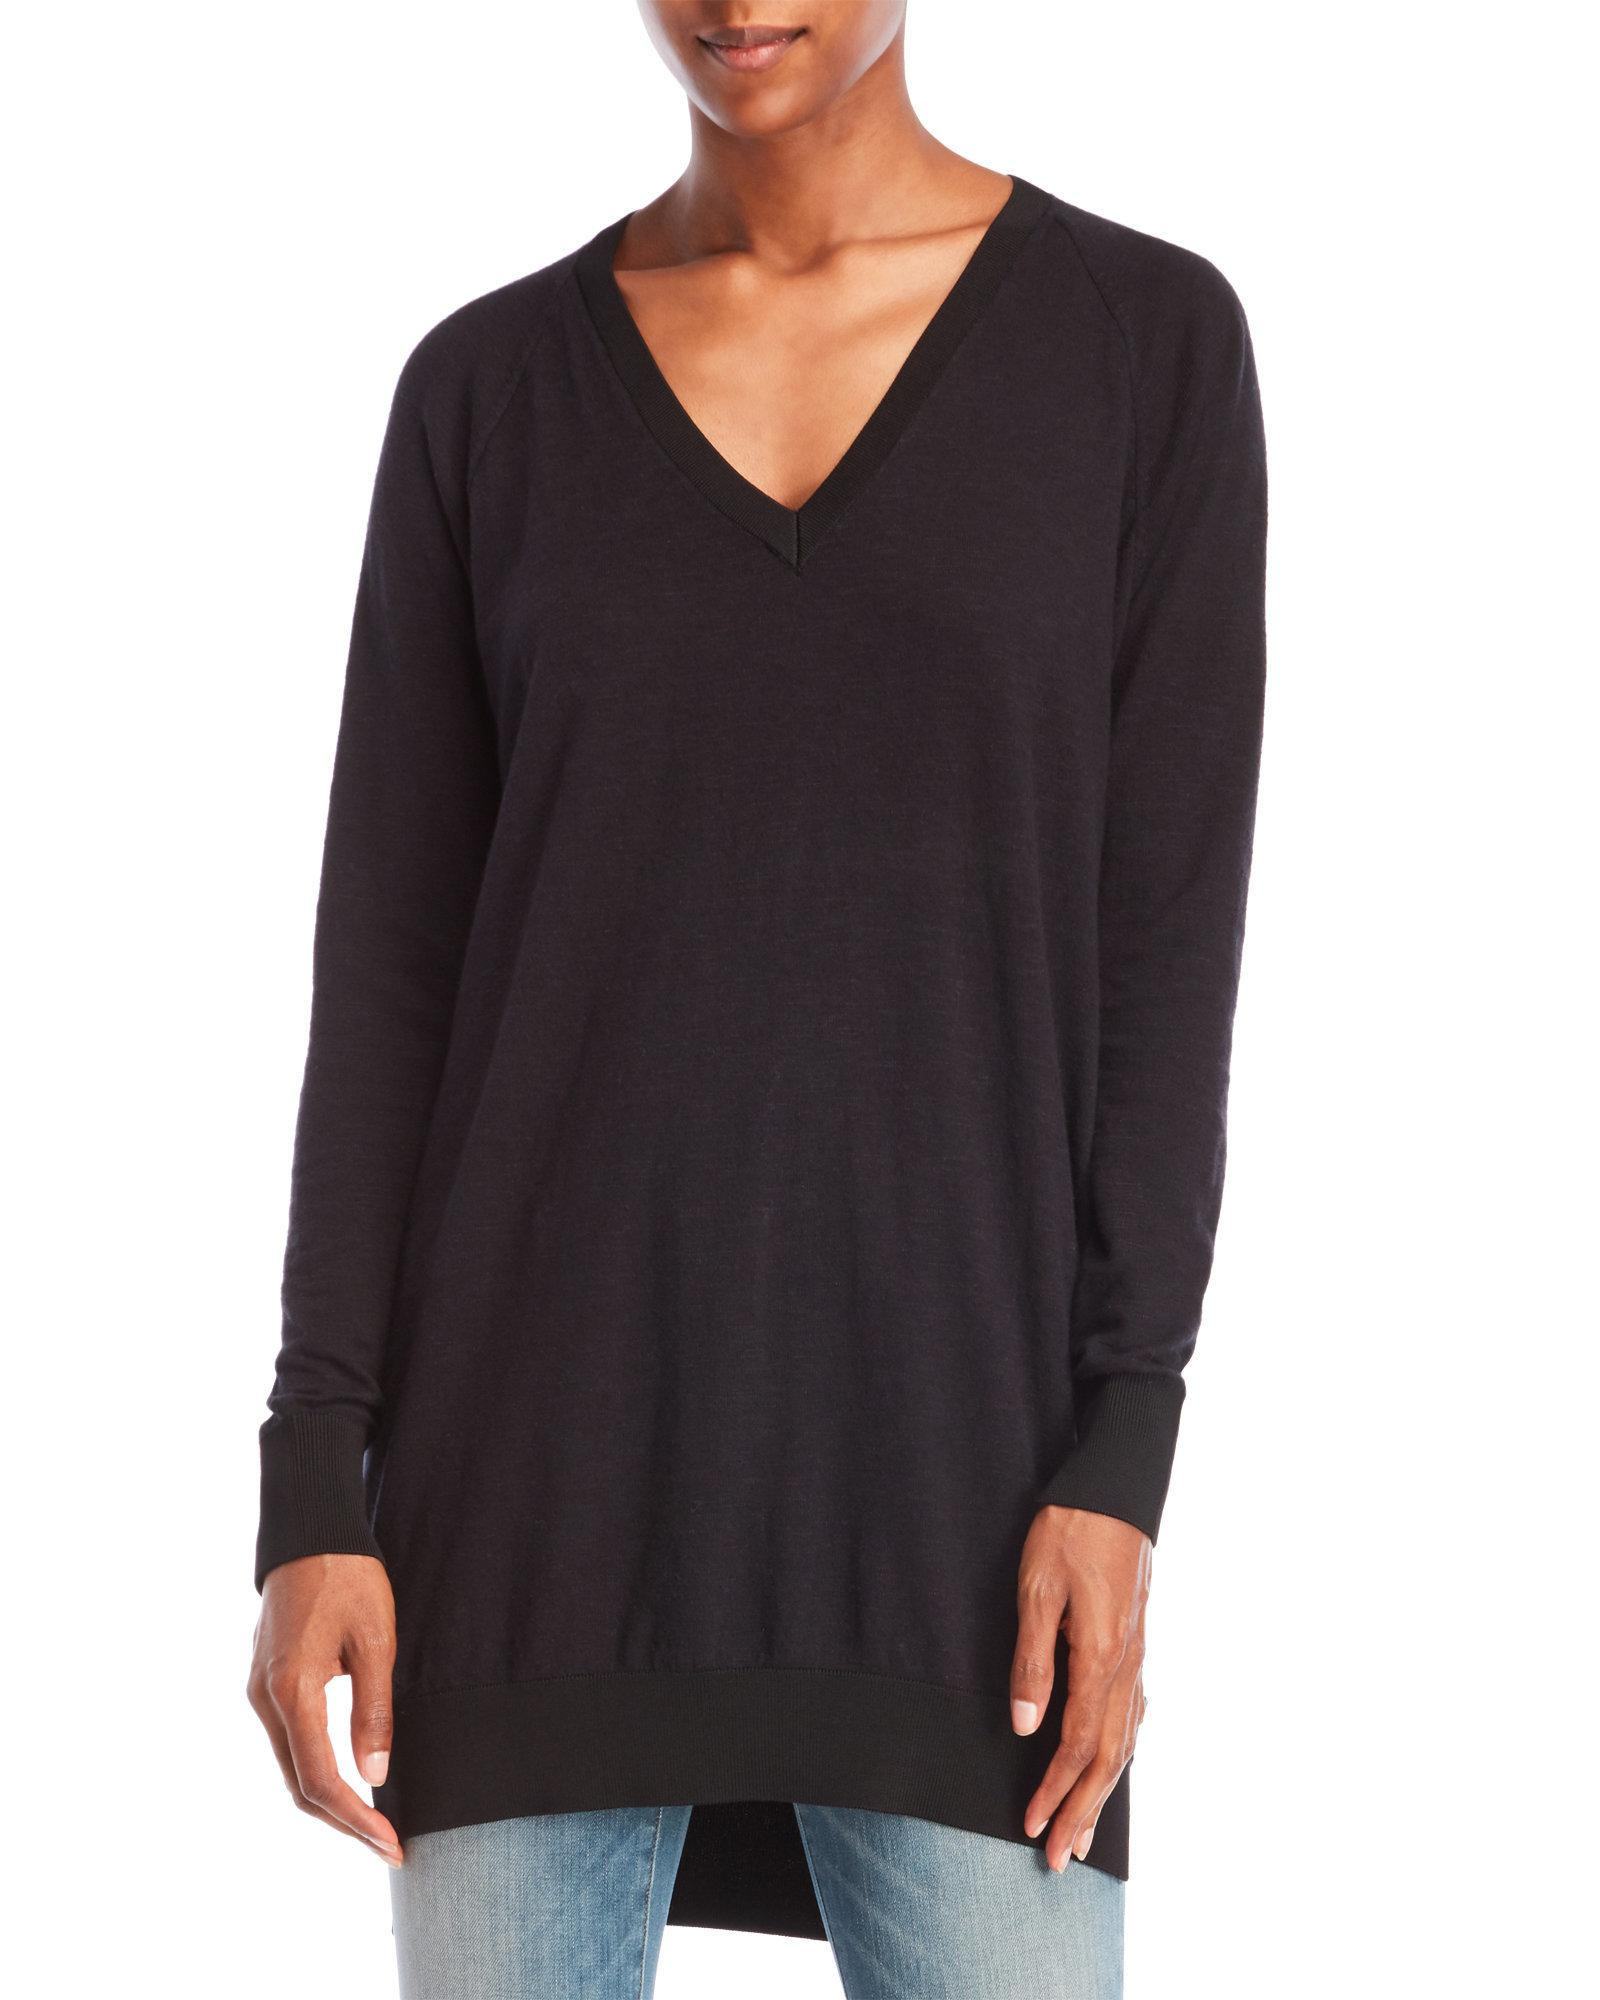 Scotch & soda V-Neck Tunic Sweater in Black | Lyst